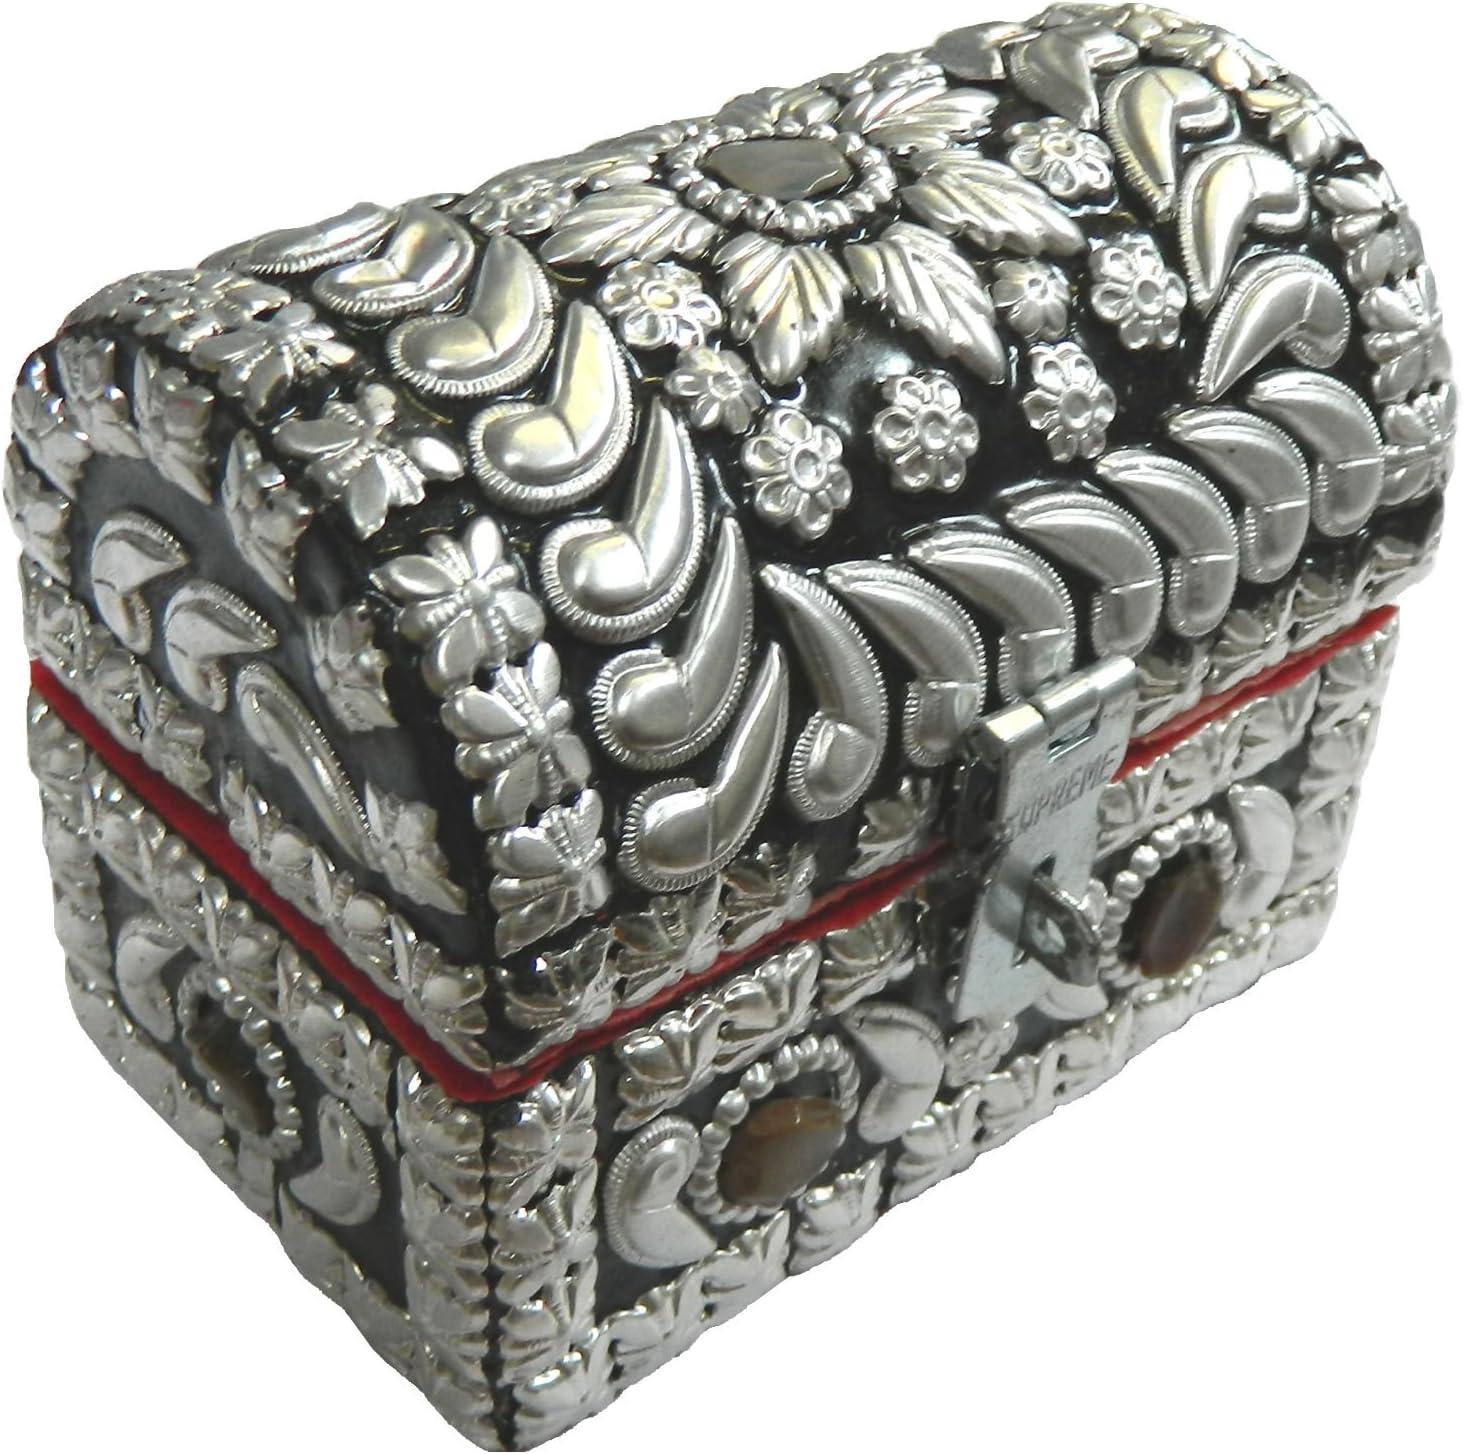 Cofre pirata plateado brillante 10 x 6,5 x 8 cm piedras de ágata almacenamiento caja